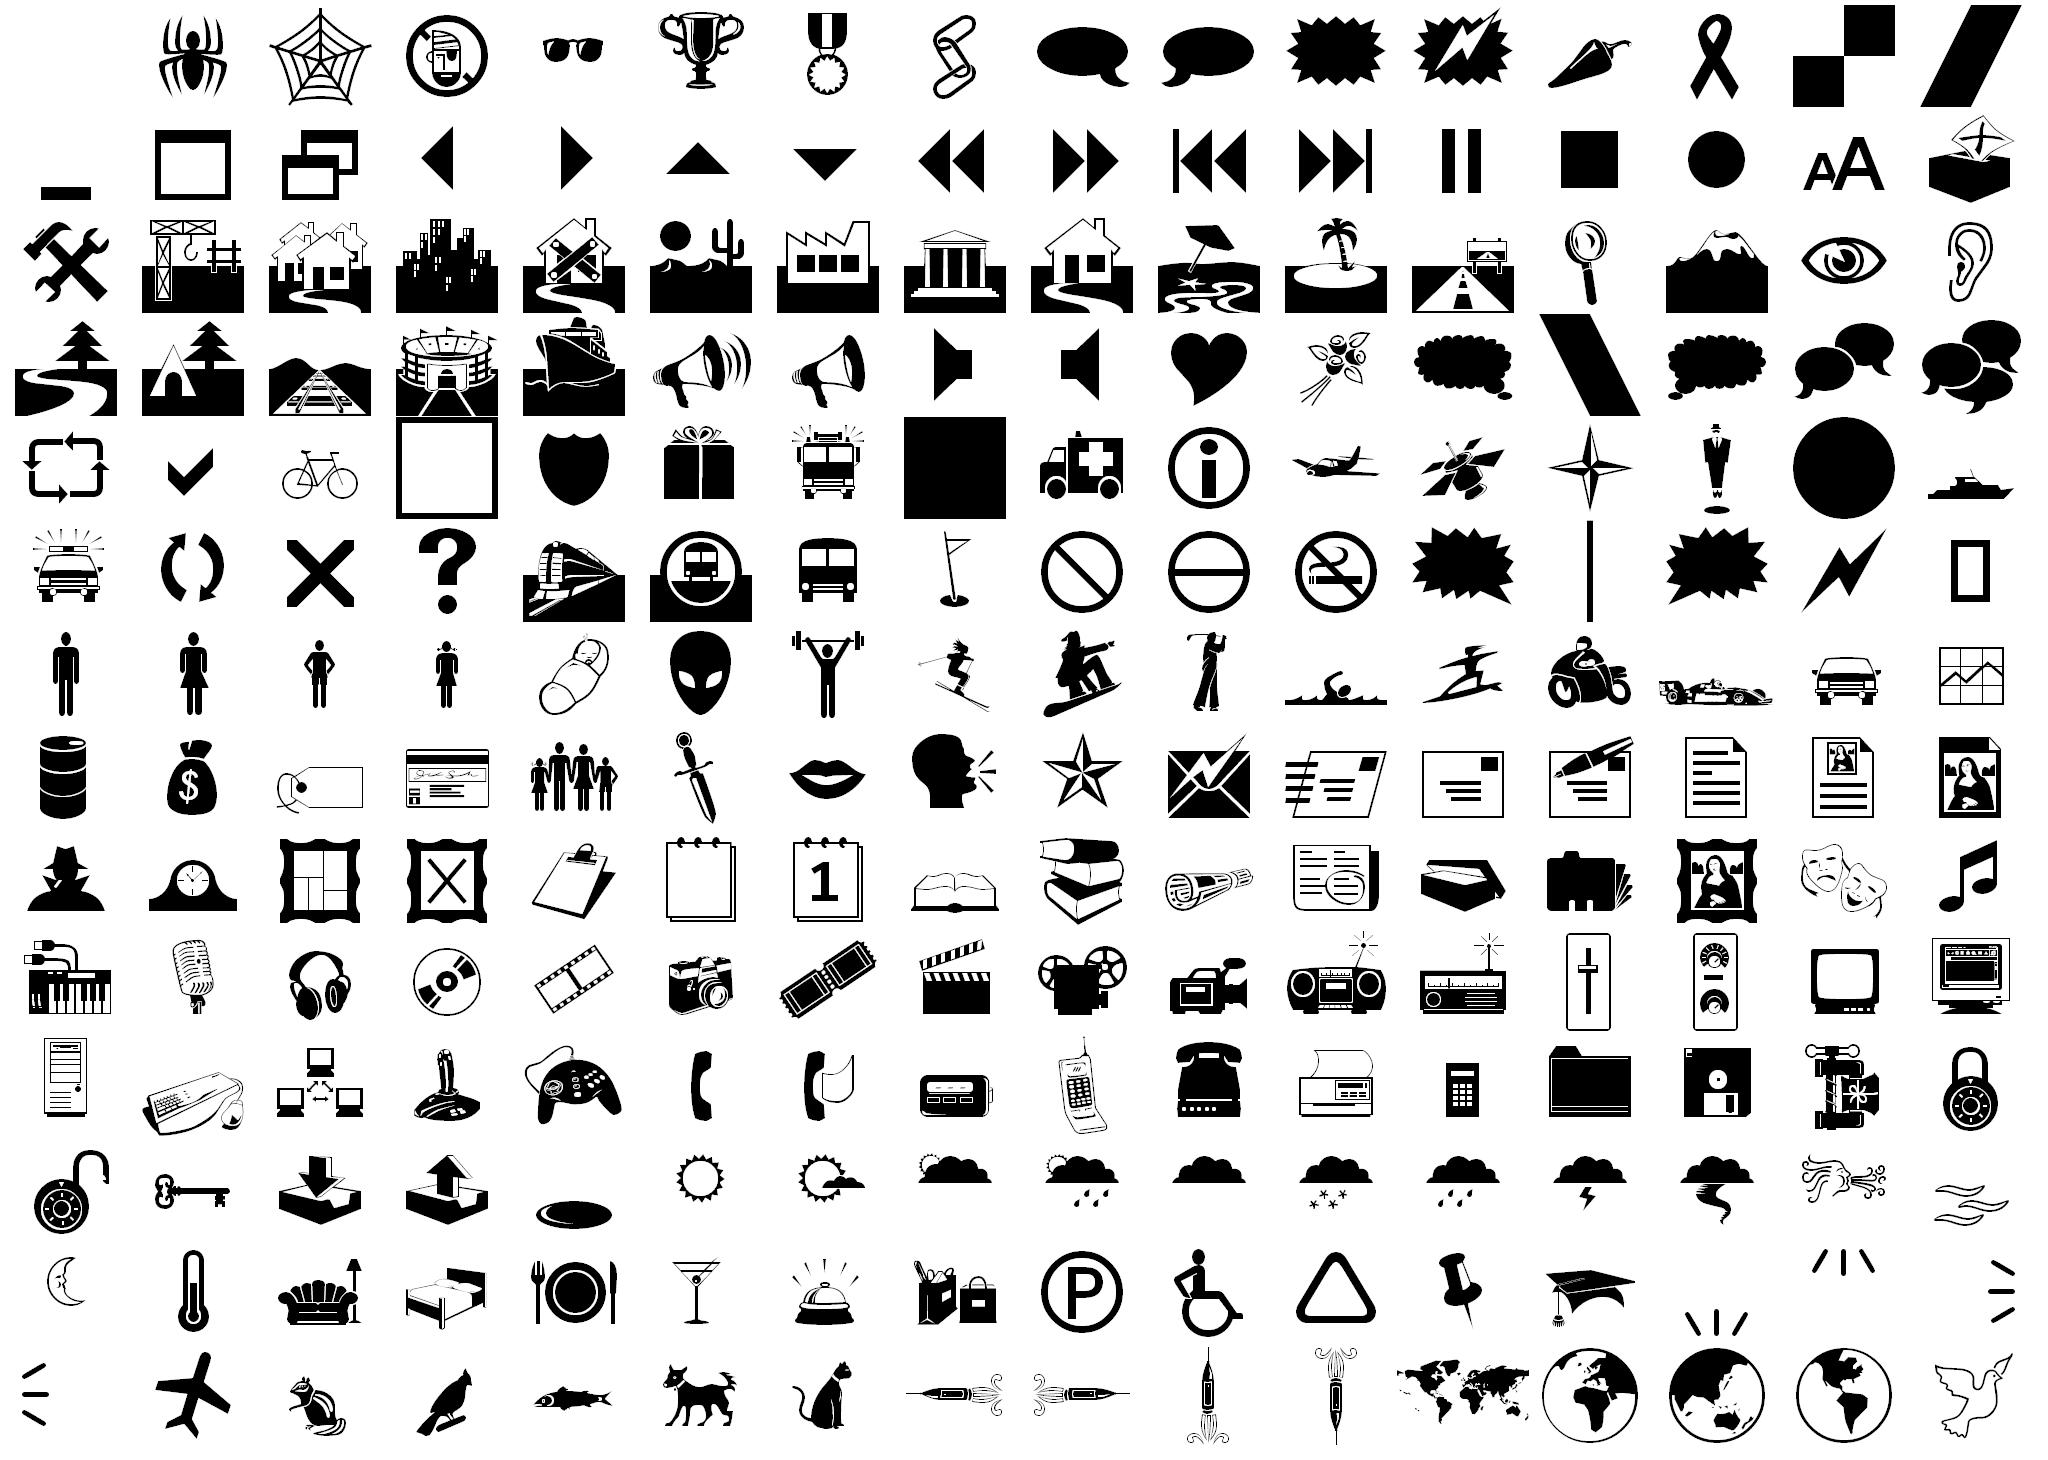 12 Diameter Symbol Font Images